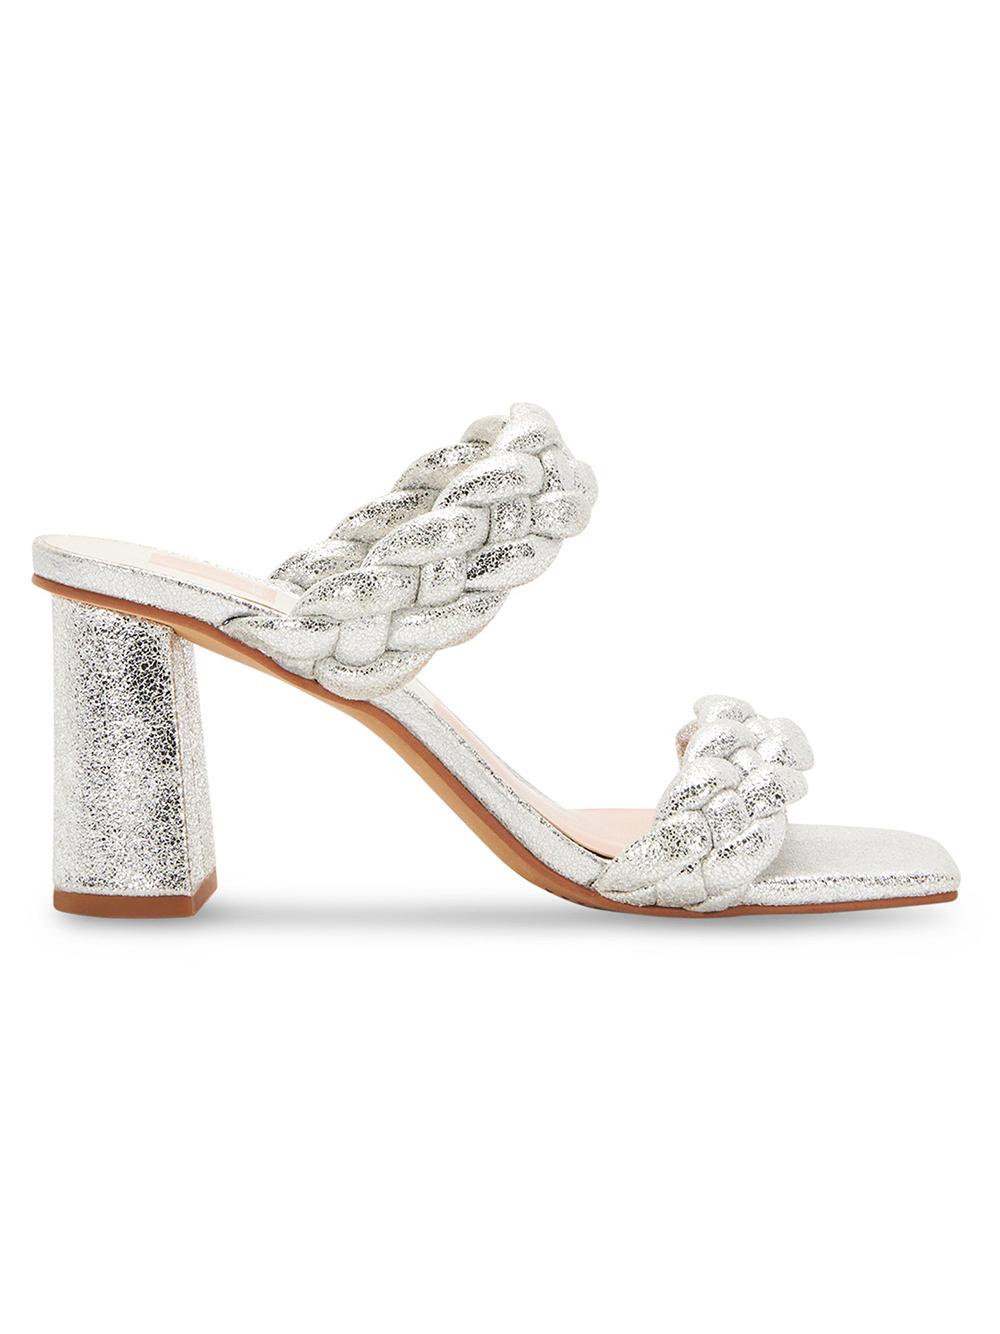 Paily Braided Metallic Sandal Item # PAILY-F21